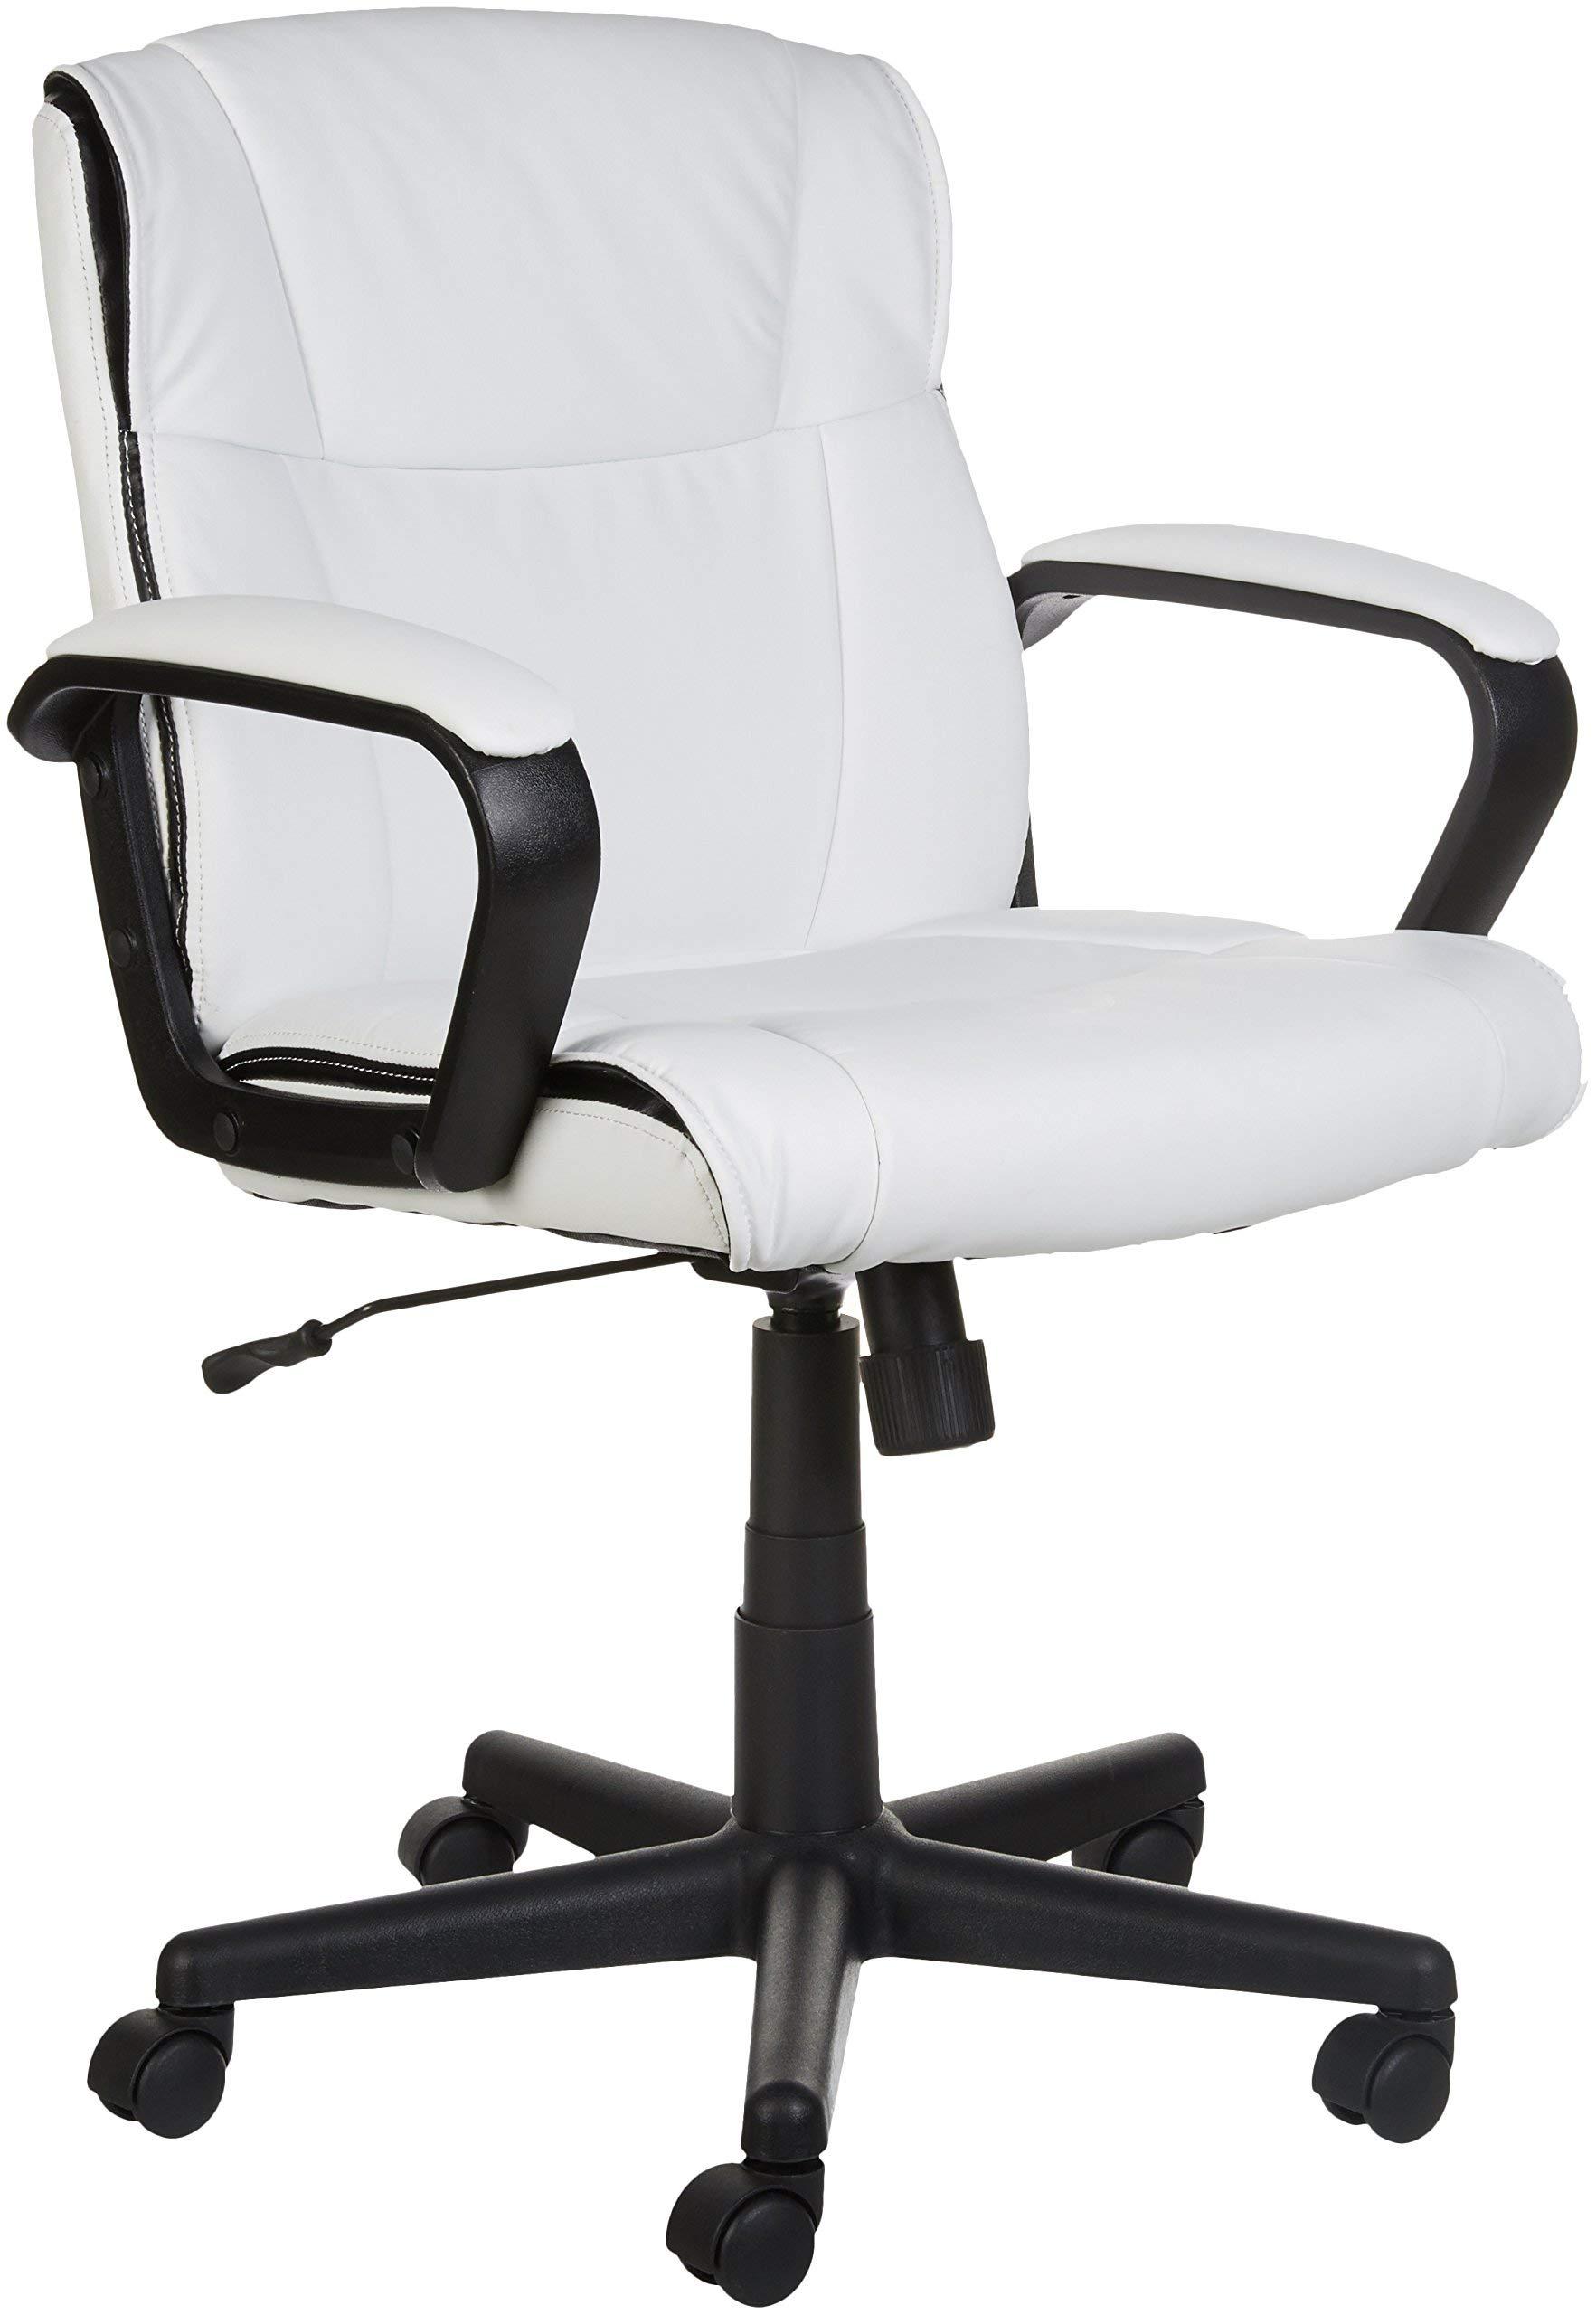 AmazonBasics Classic Leather-Padded Mid-Back Office Chair with Armrest - White by AmazonBasics (Image #1)